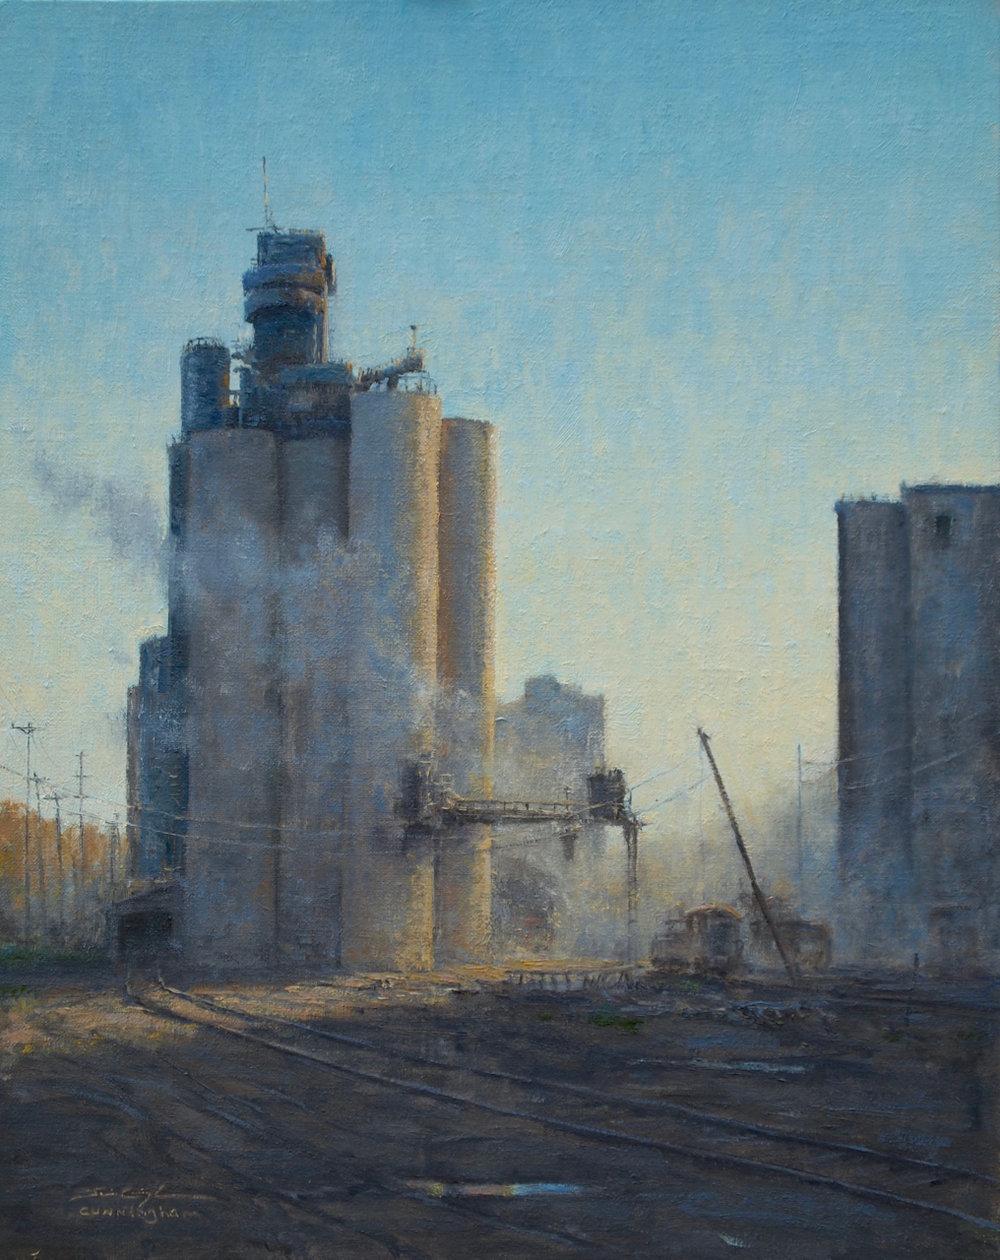 Joshua Cunningham - Dust and Steam